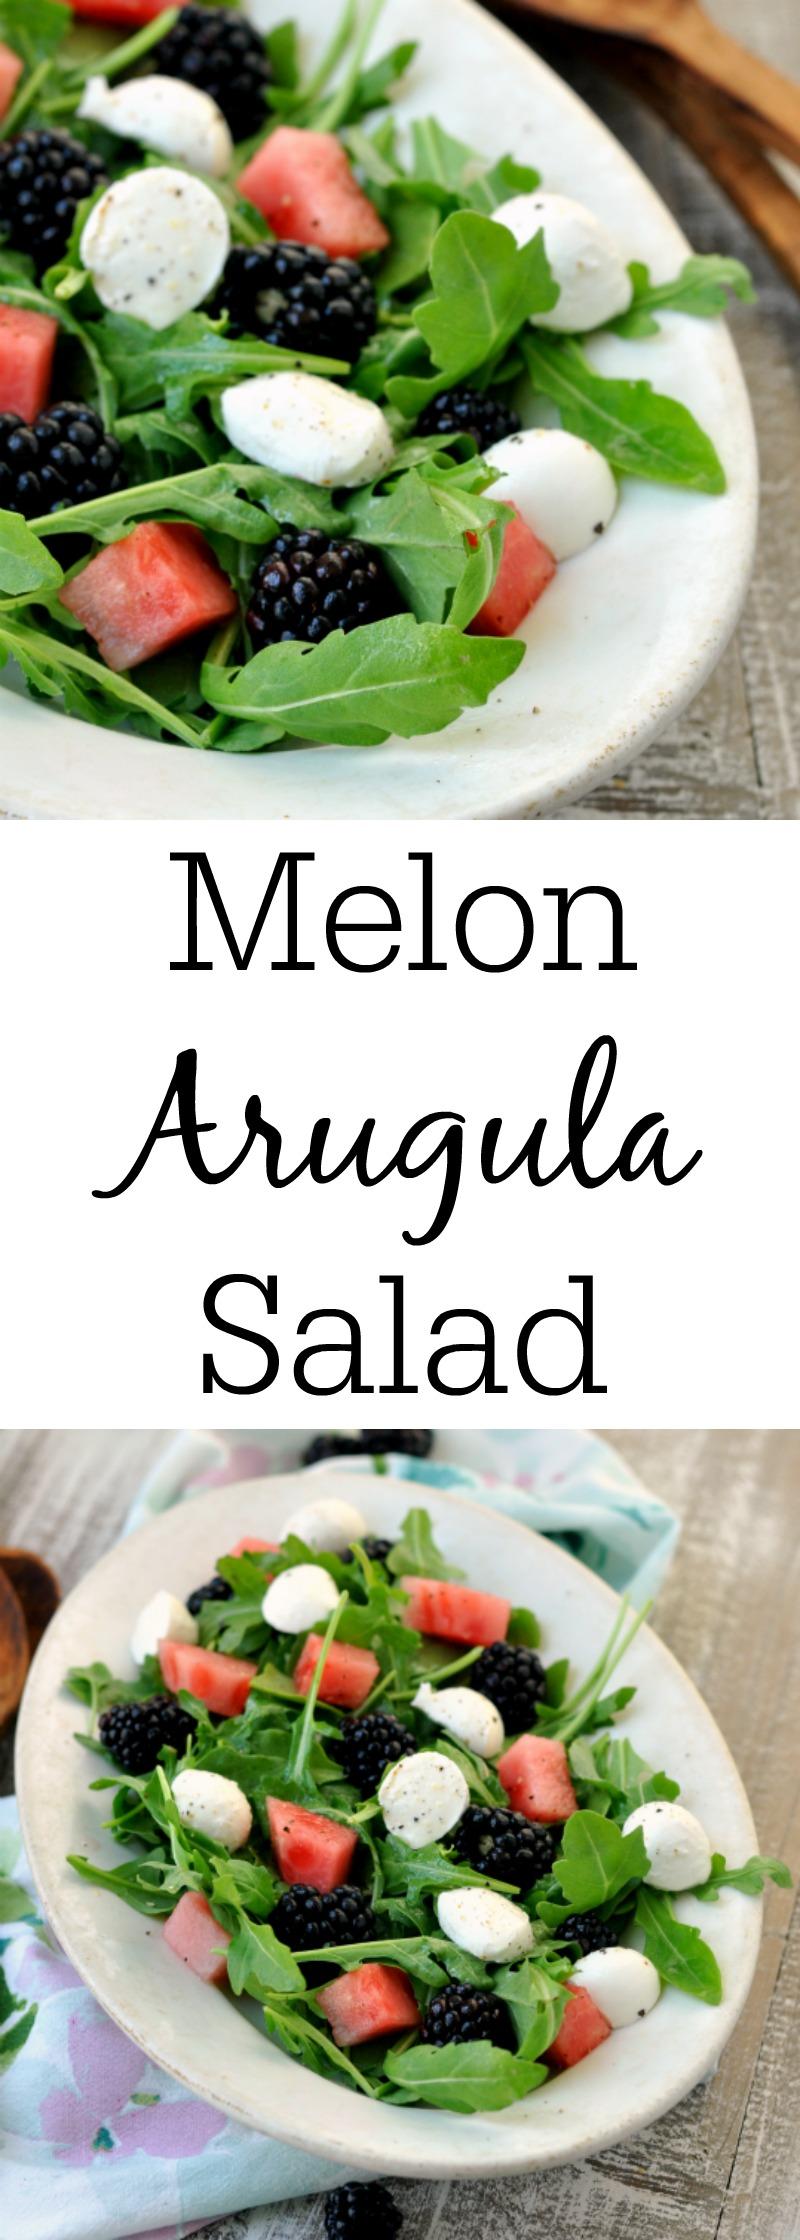 Melon Arugula Salad - My Suburban Kitchen